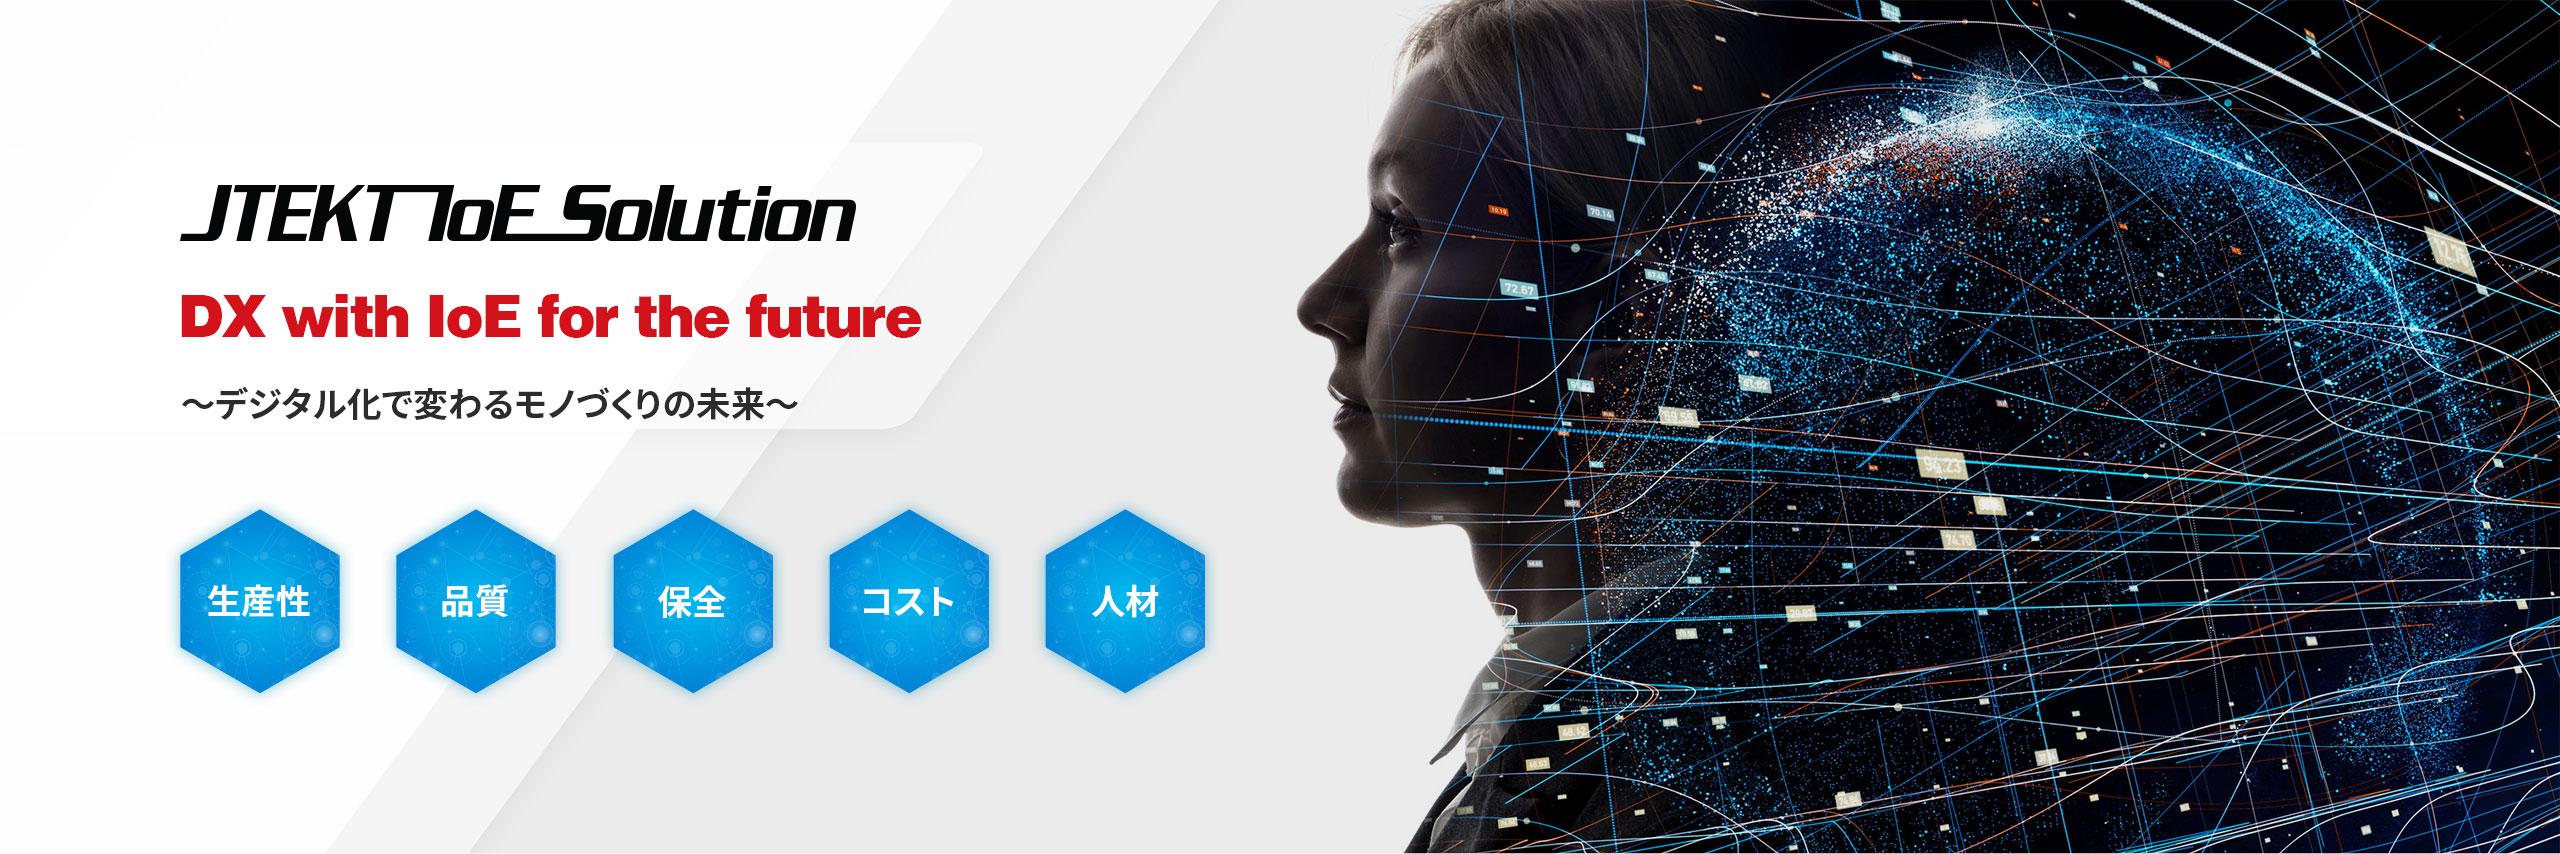 JTEKTIoE Solution DX with IoE for the future~デジタル化で変わるモノづくりの未来~